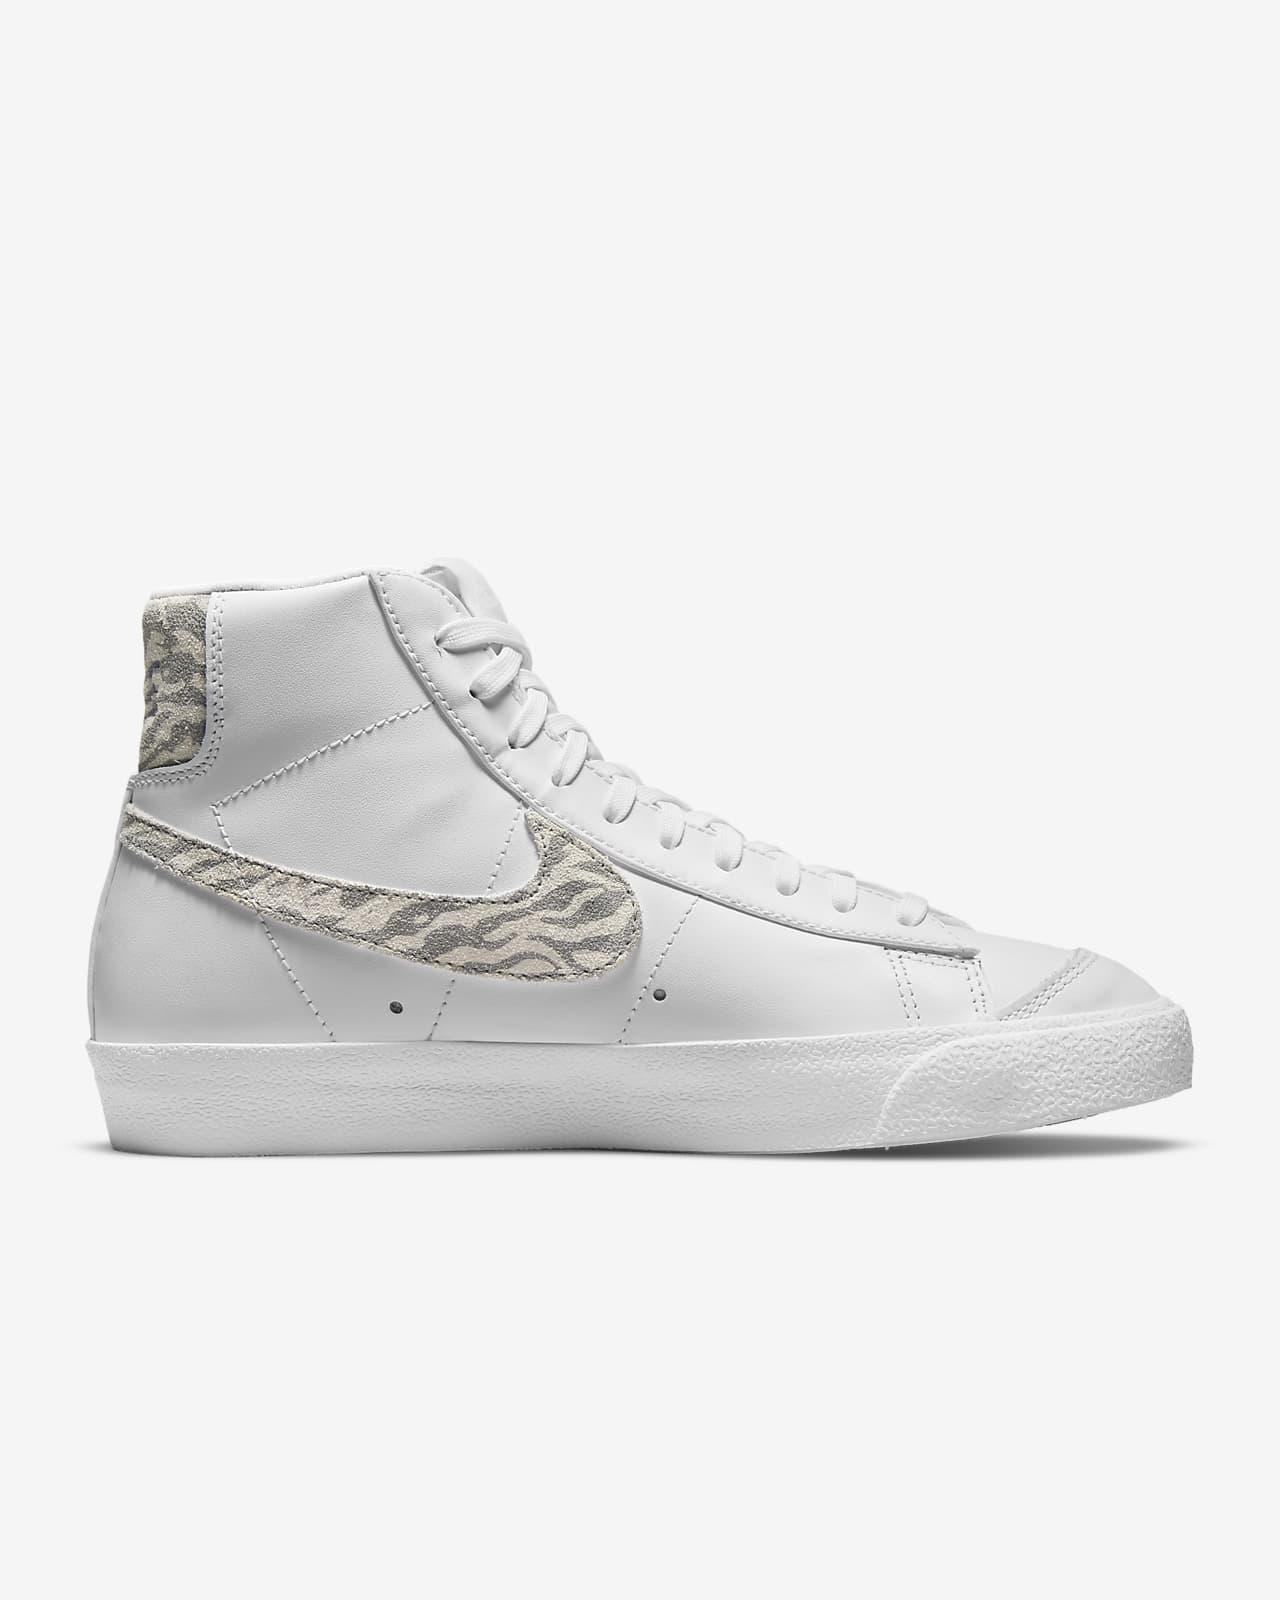 Nike Blazer Mid '77 SE Women's Shoe. Nike LU